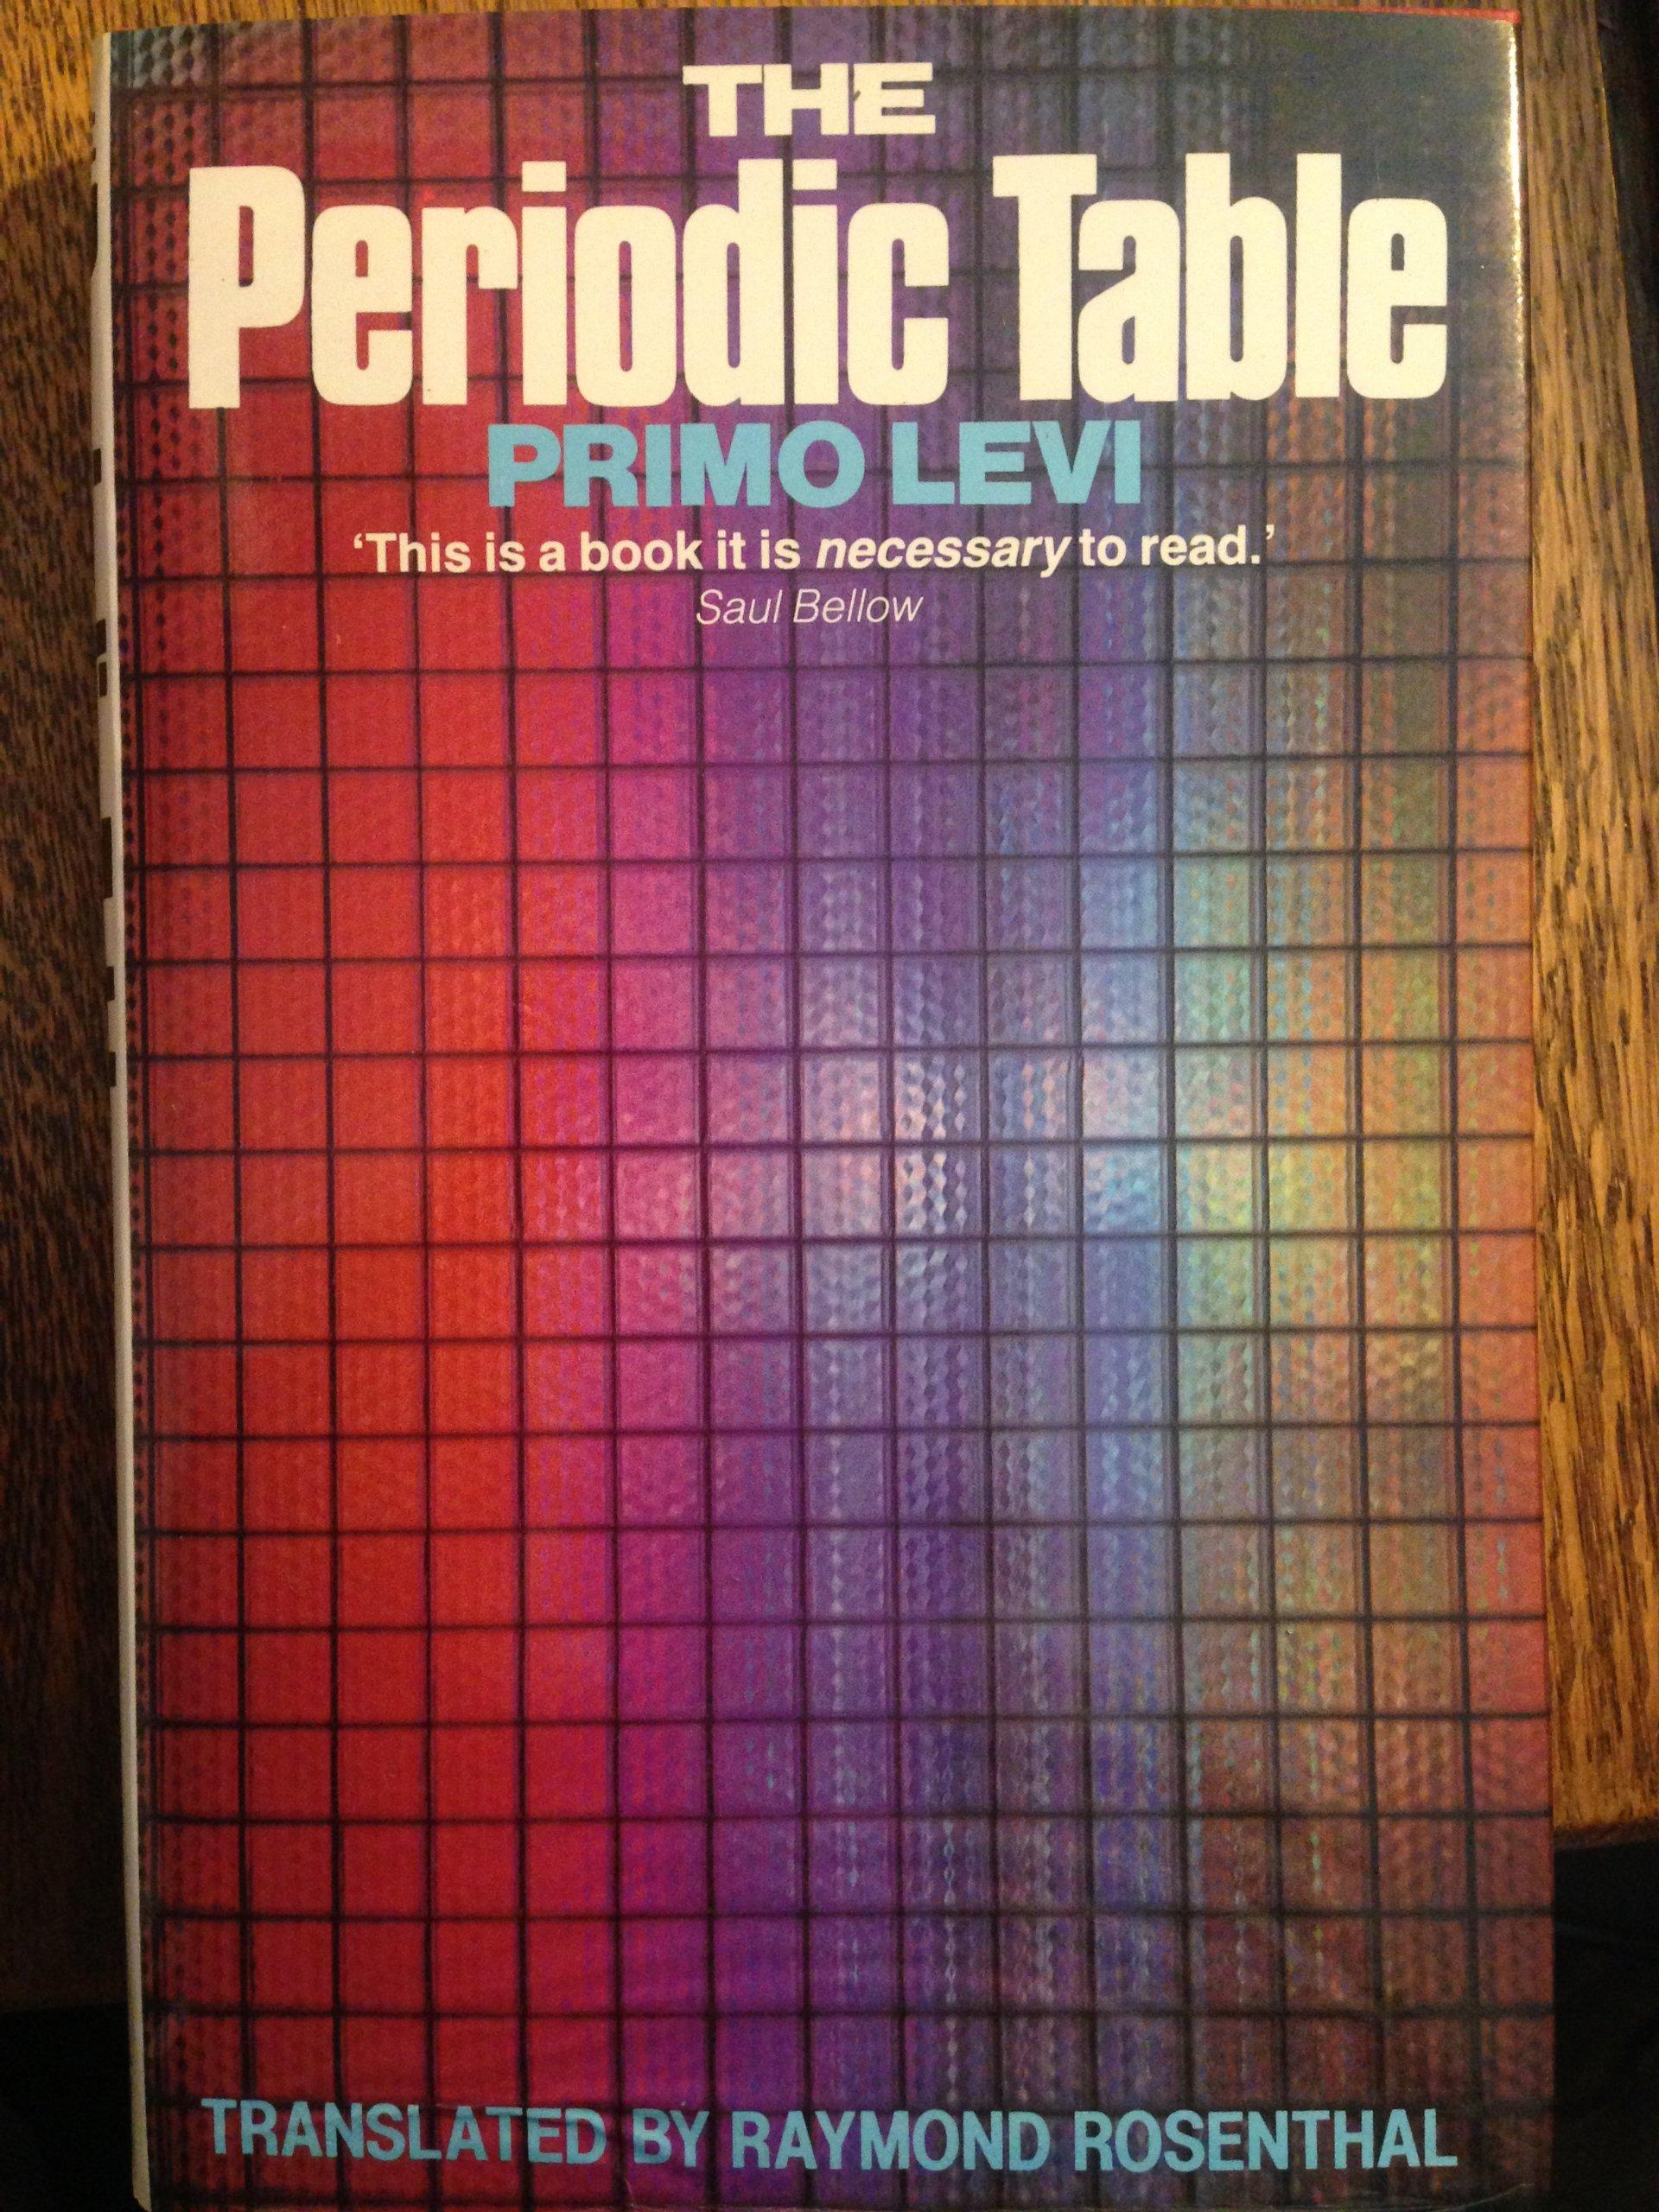 The periodic table amazon primo levi r rosenthal the periodic table amazon primo levi r rosenthal 9780718126360 books gamestrikefo Choice Image